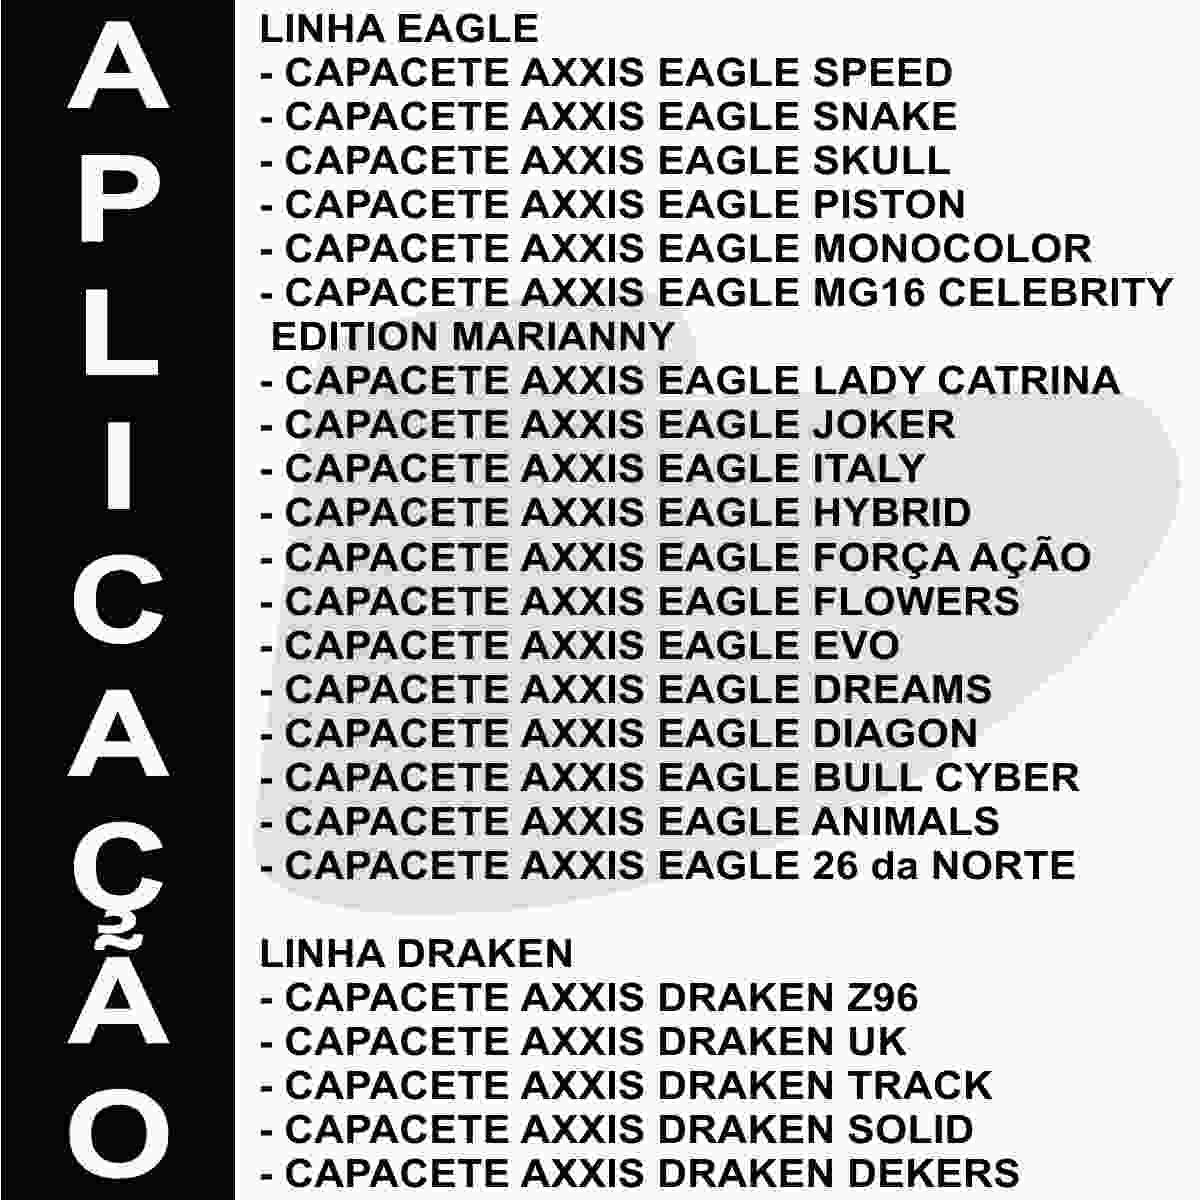 KIT VISEIRA AXXIS EAGLE/DRAKEN BLACK FUMÊ V18 + VISEIRA IRIDIUM CAMALEÃO